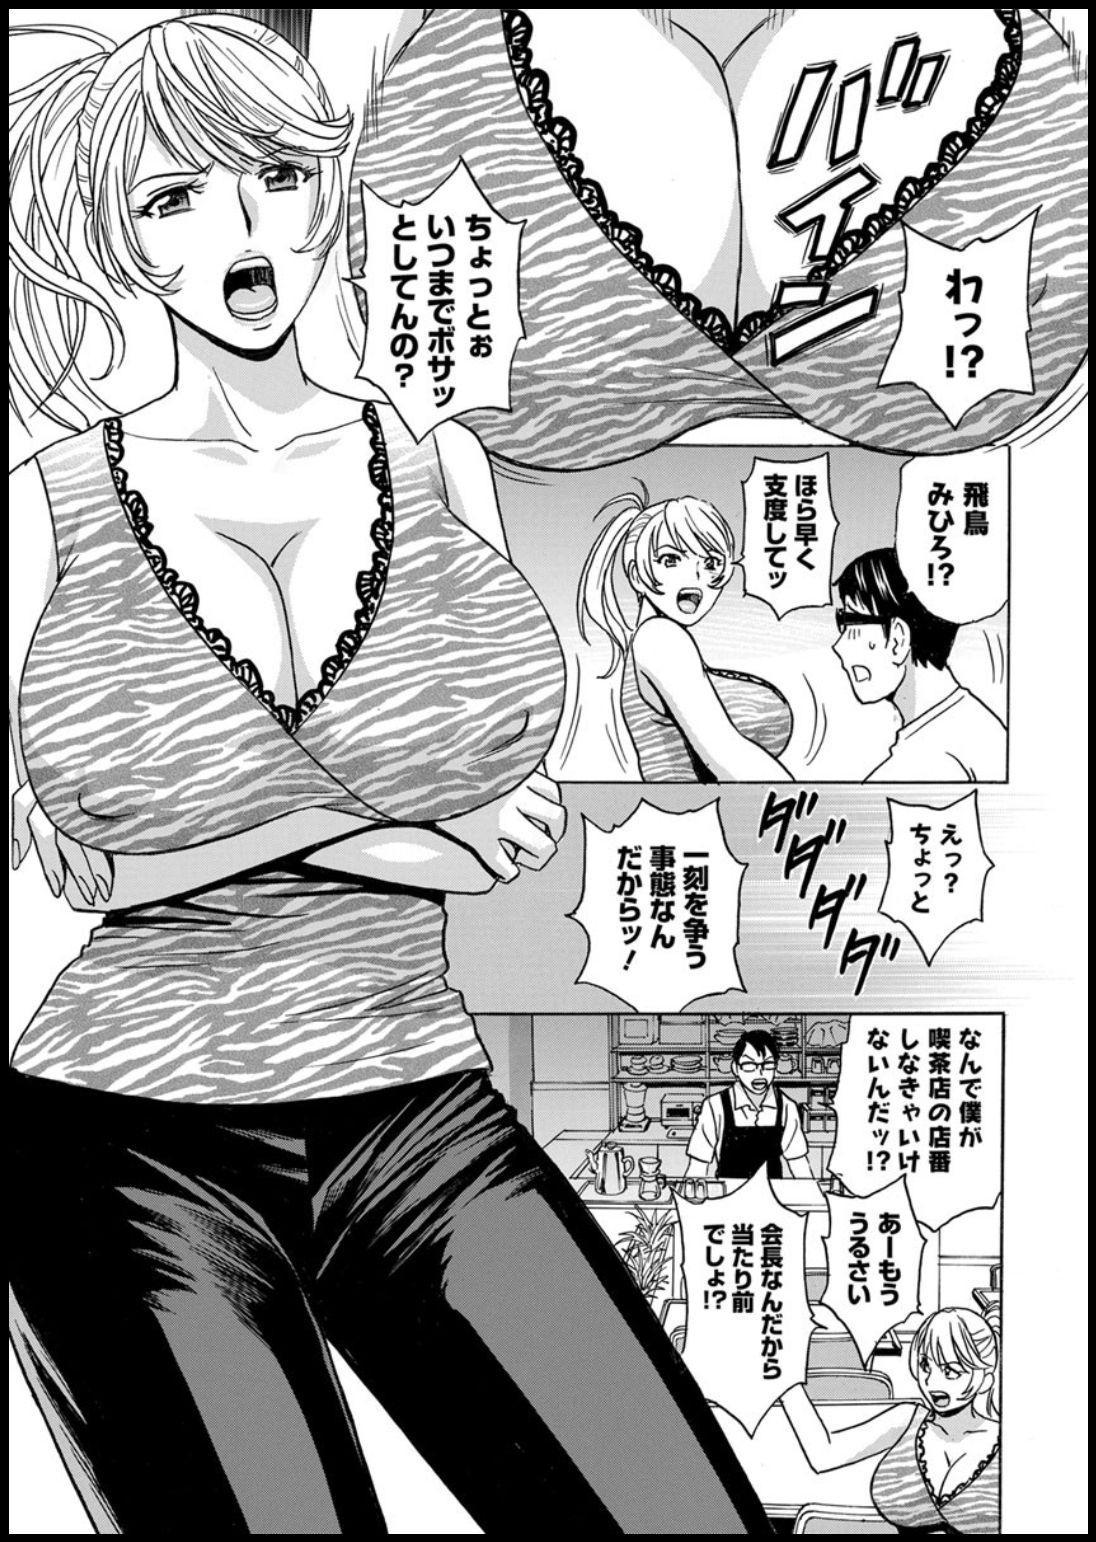 [Hidemaru] Yurase Bikyonyuu! Hataraku J-Cup Ch. 1-5 [Digital] 10